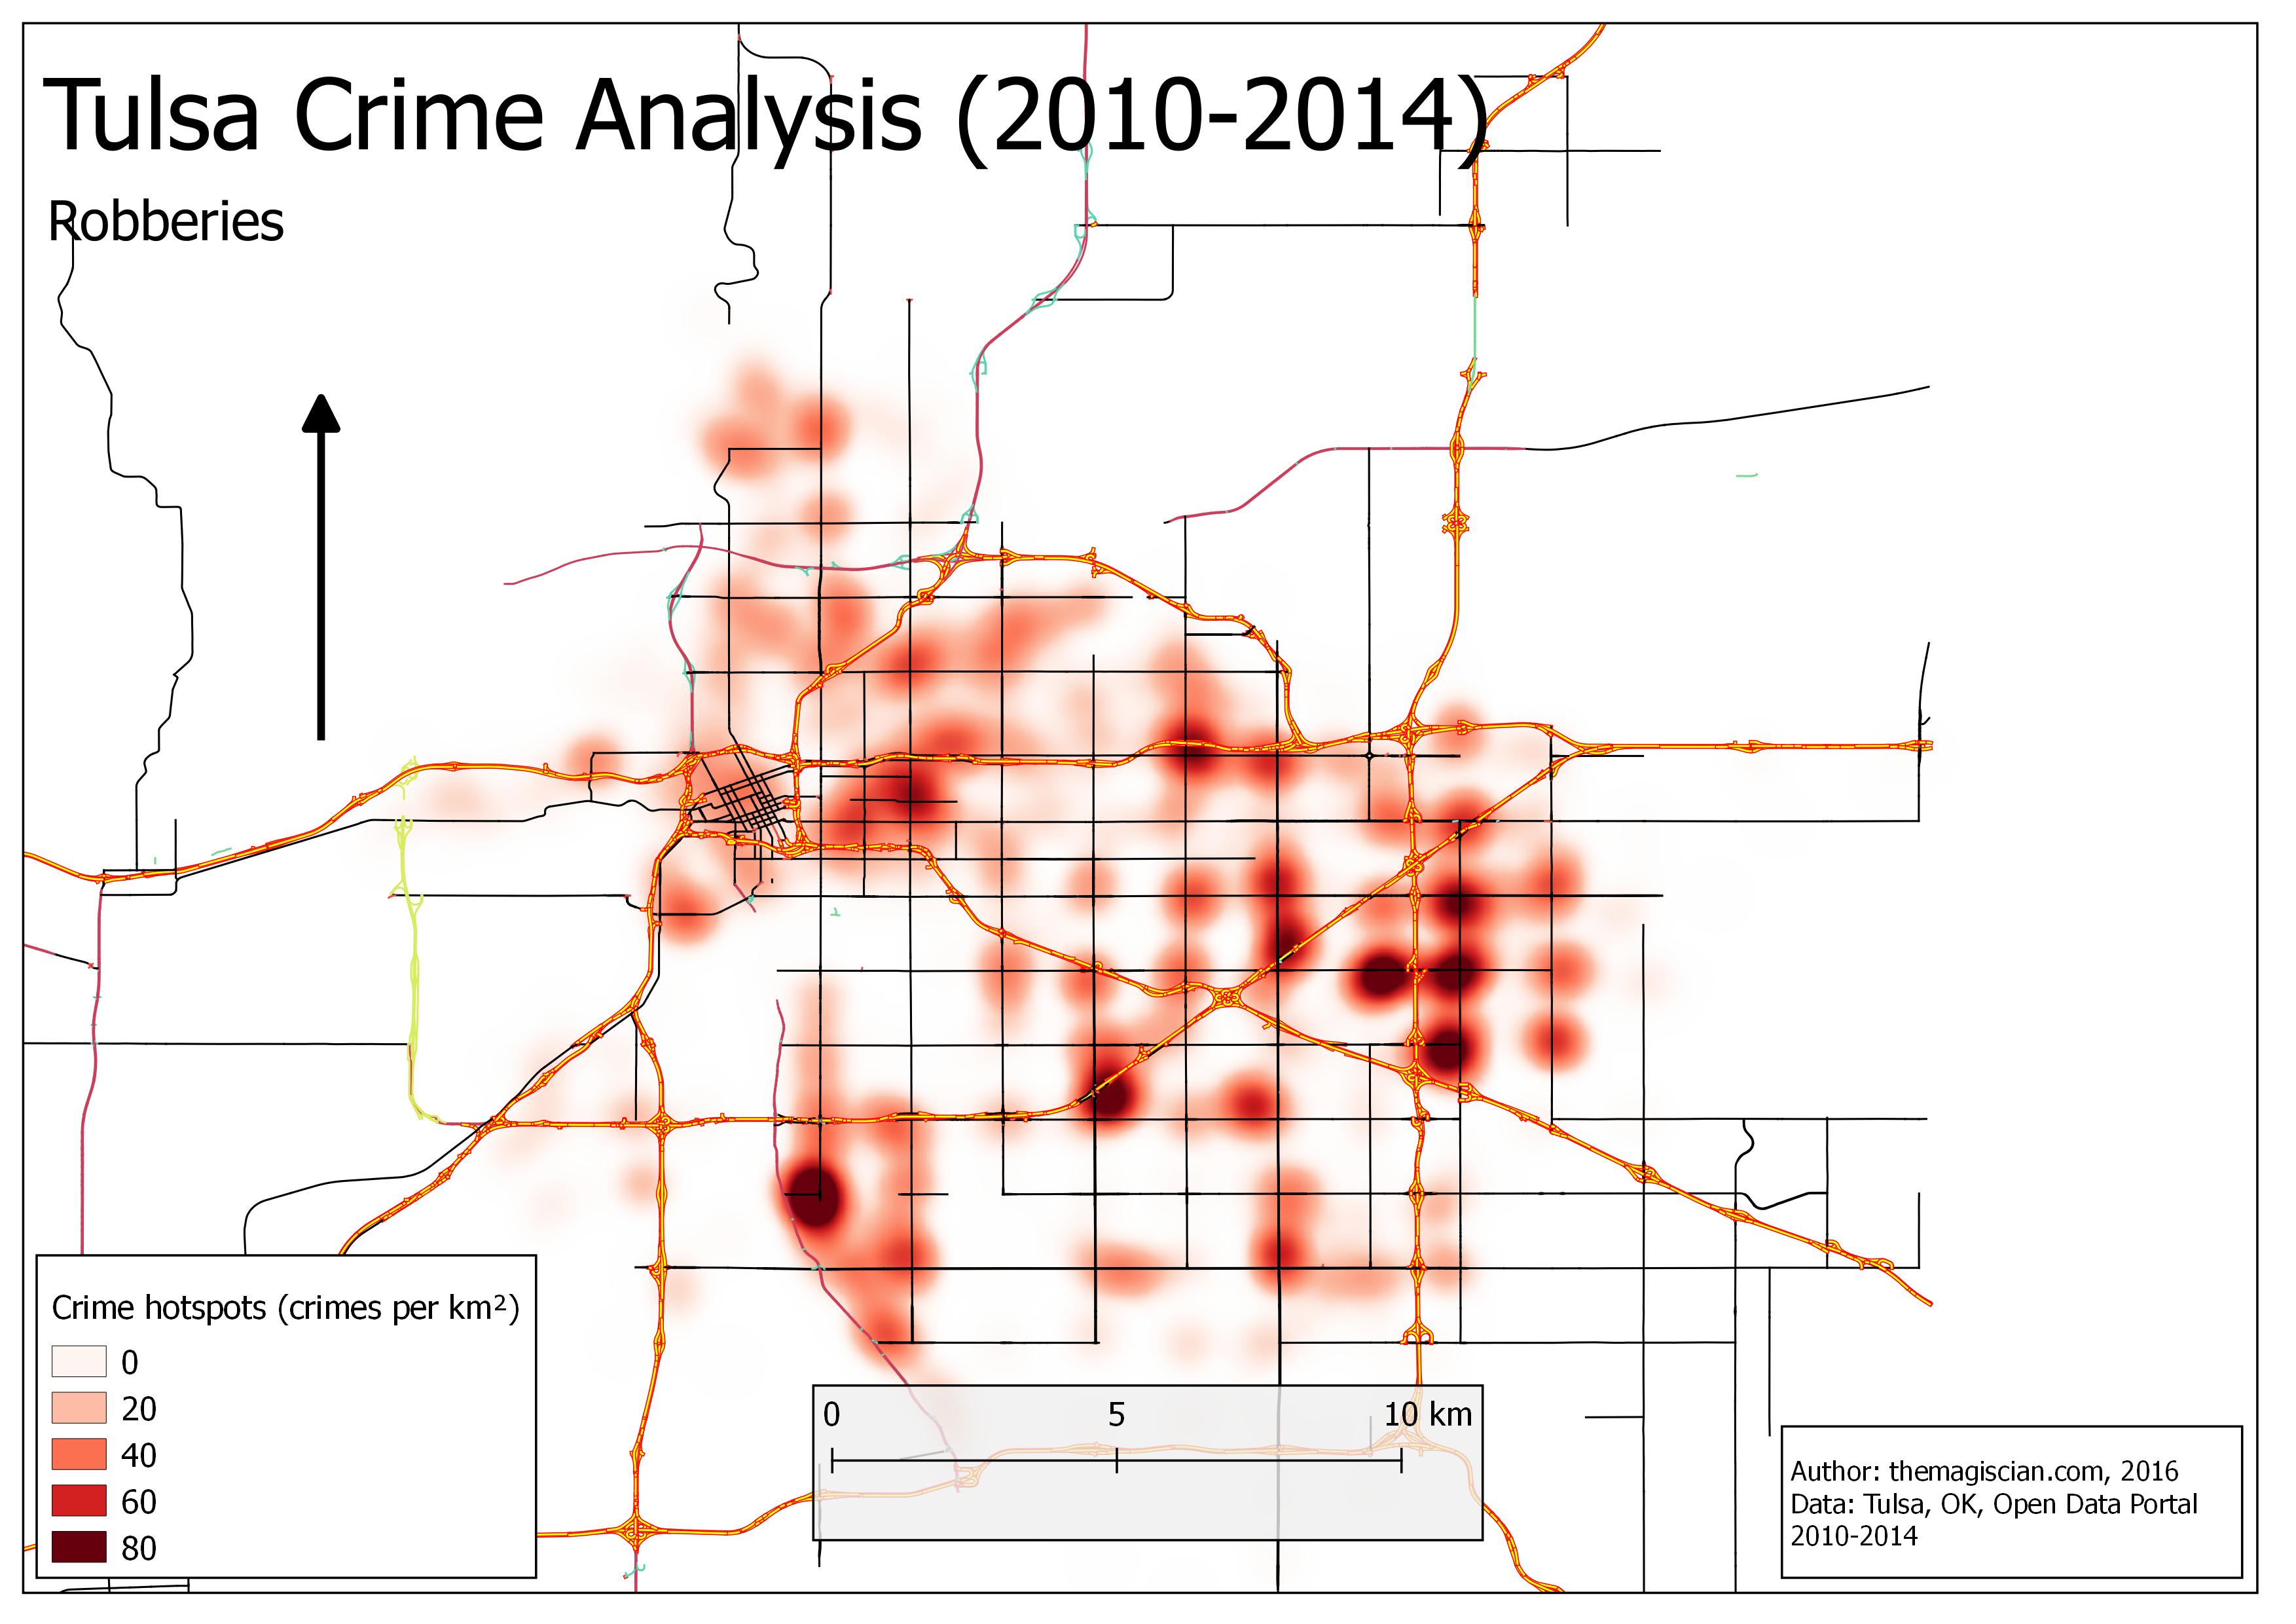 Robberies Hotspots (2010-2014)